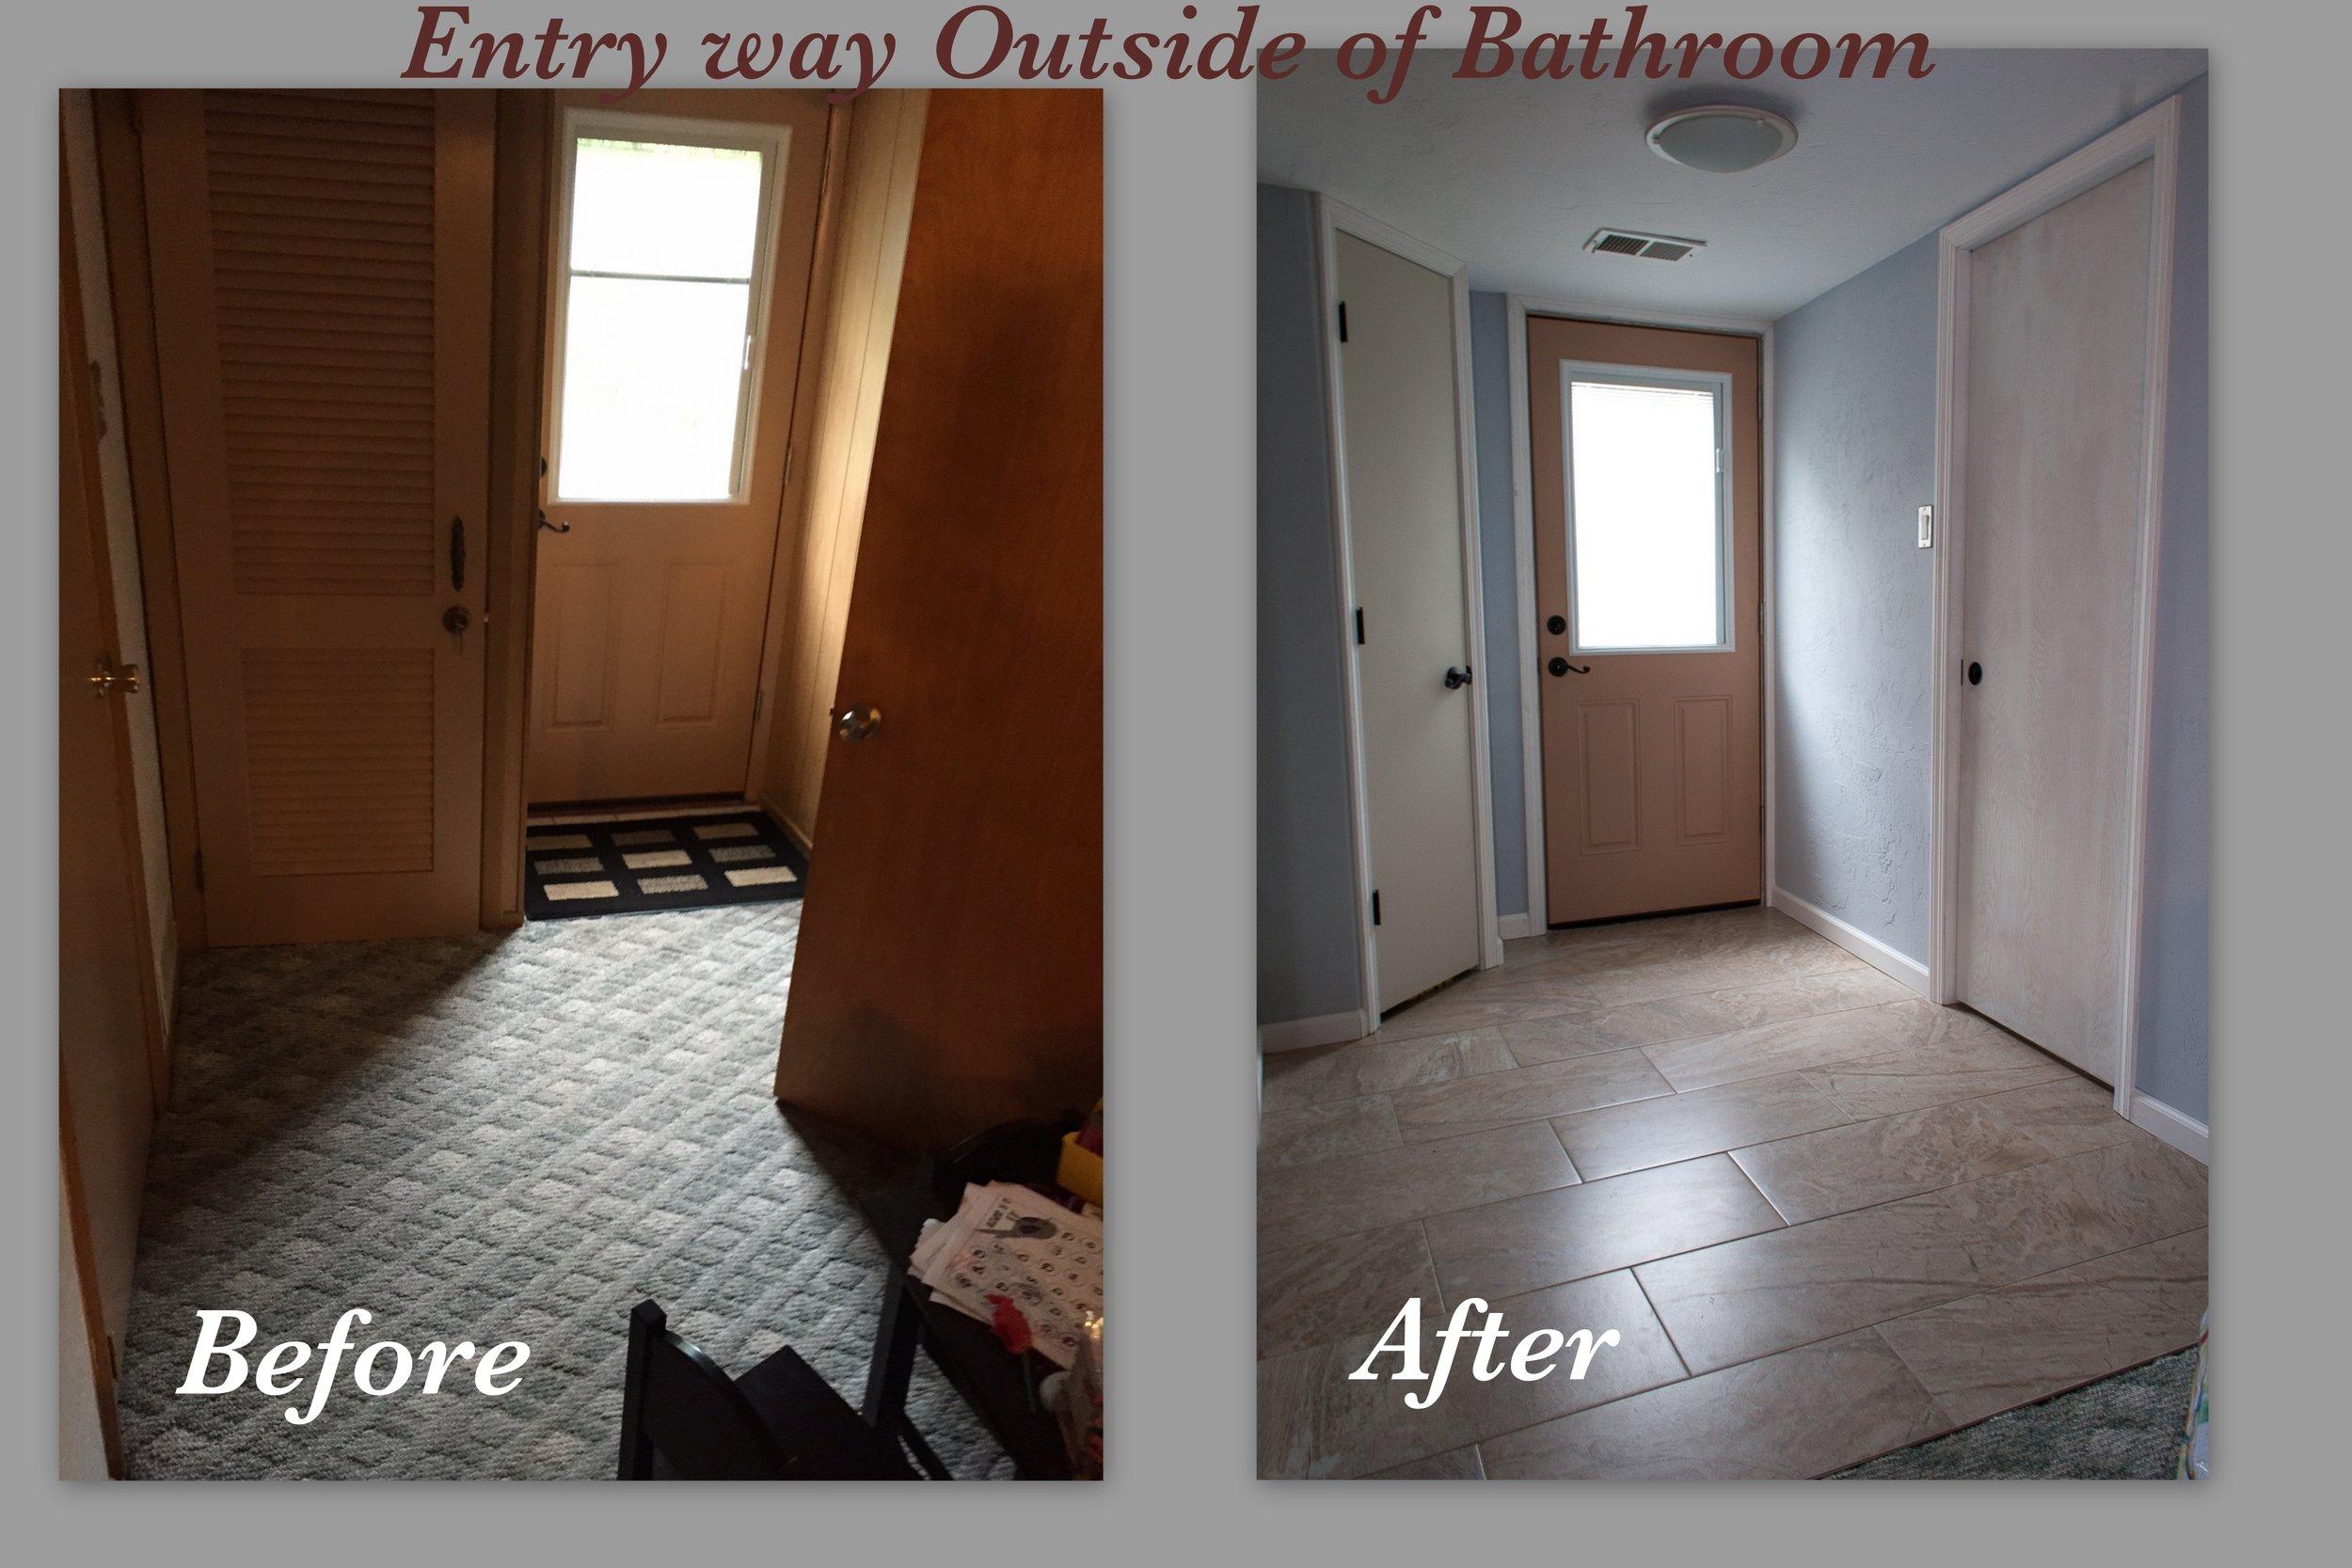 B4 & After entryway.jpg